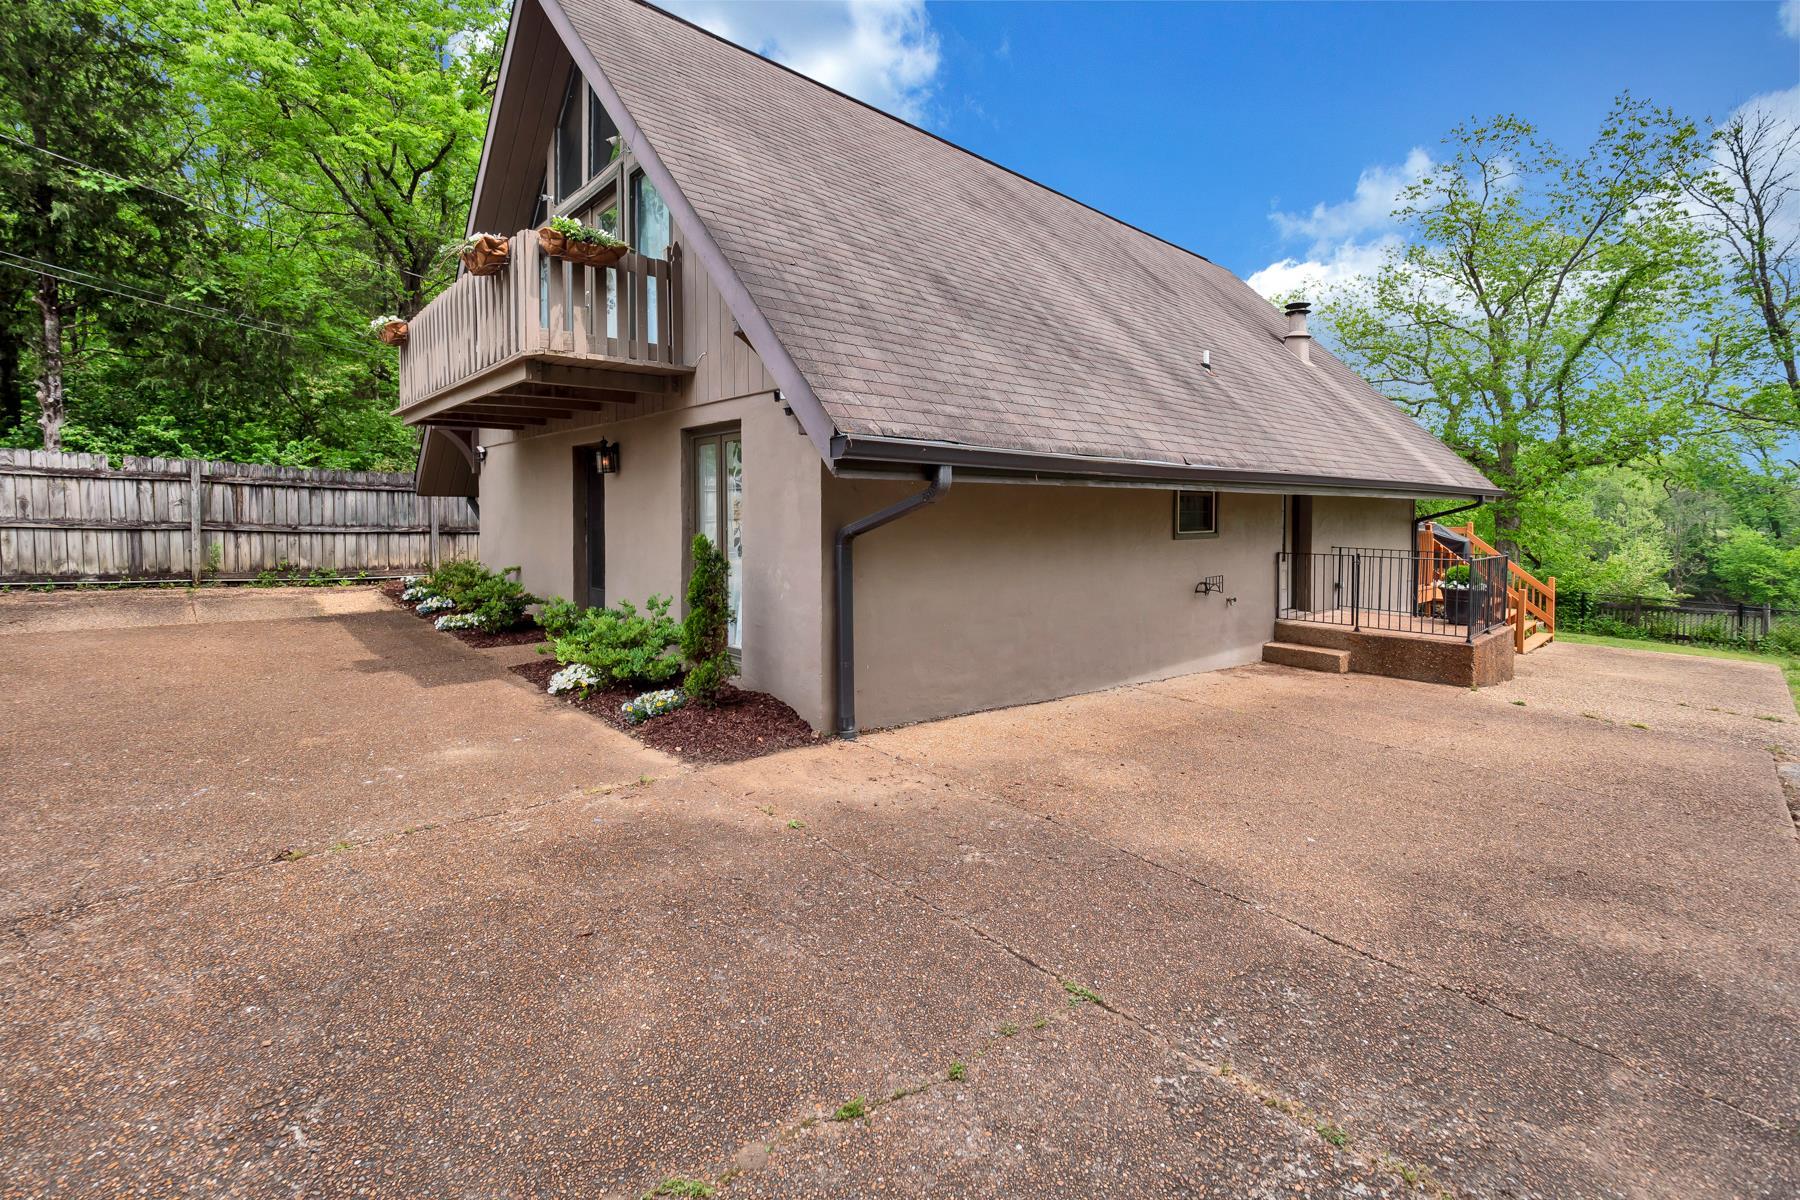 A Frame Houses For Sale